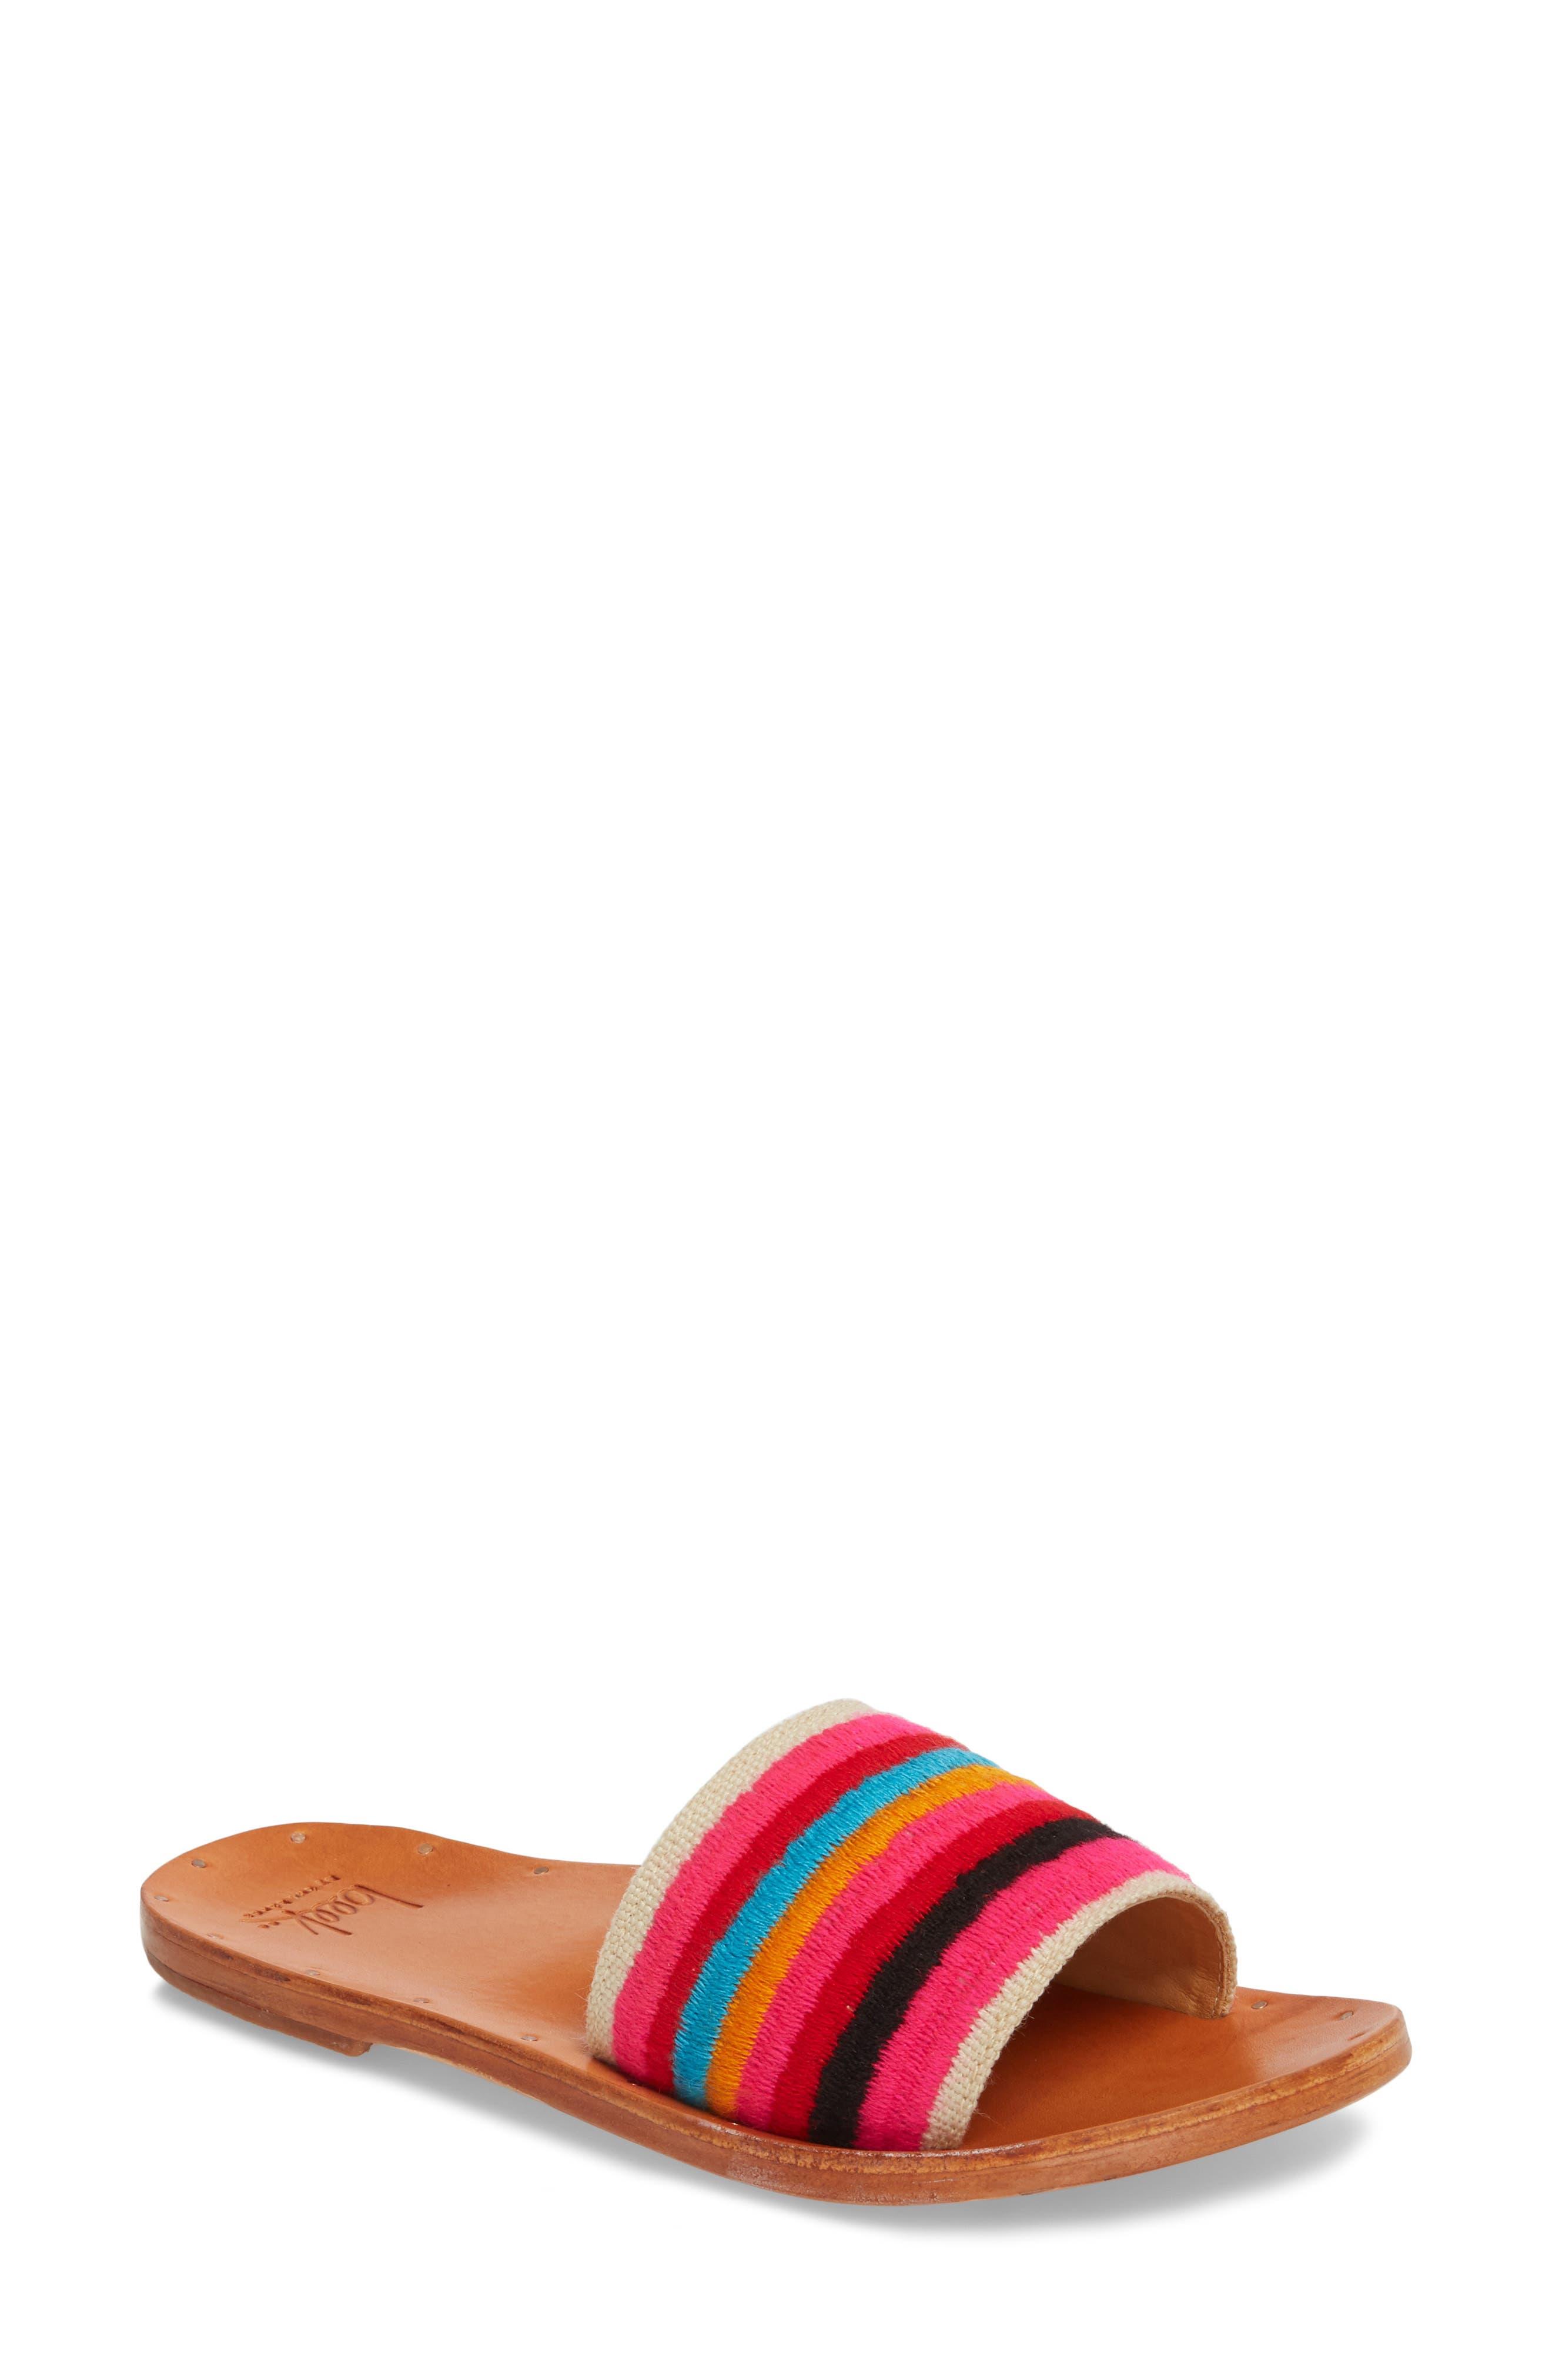 Lovebird Embroidered Slide Sandal,                             Main thumbnail 1, color,                             Multi/ Tan